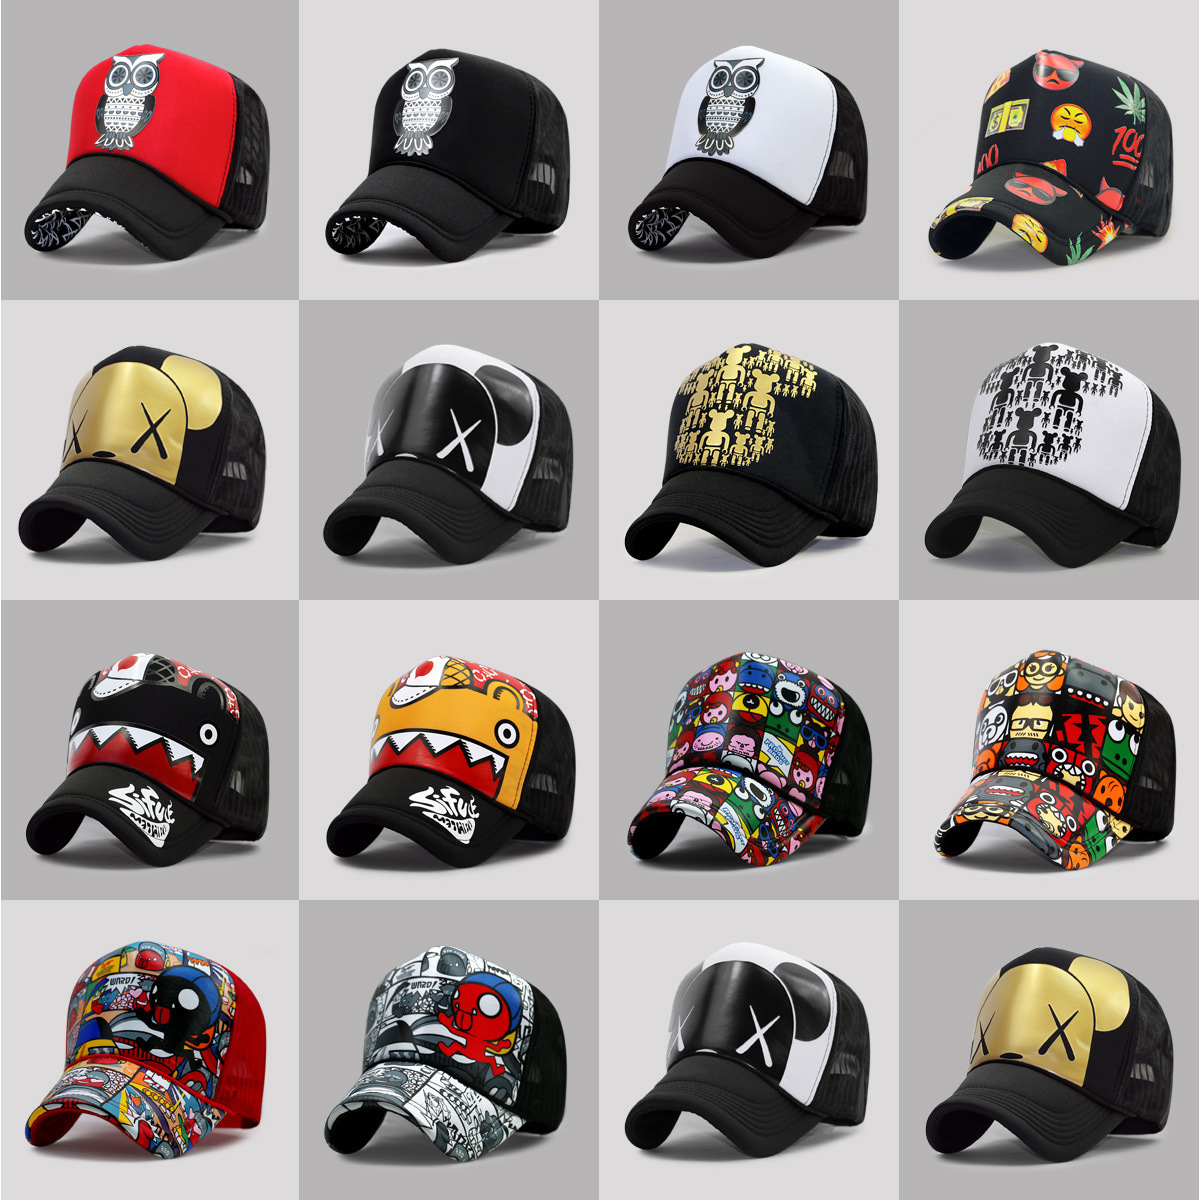 Adjustable Hip Hop Baseball Caps Boxer Dog 3 Women Men Punk Rock Cap